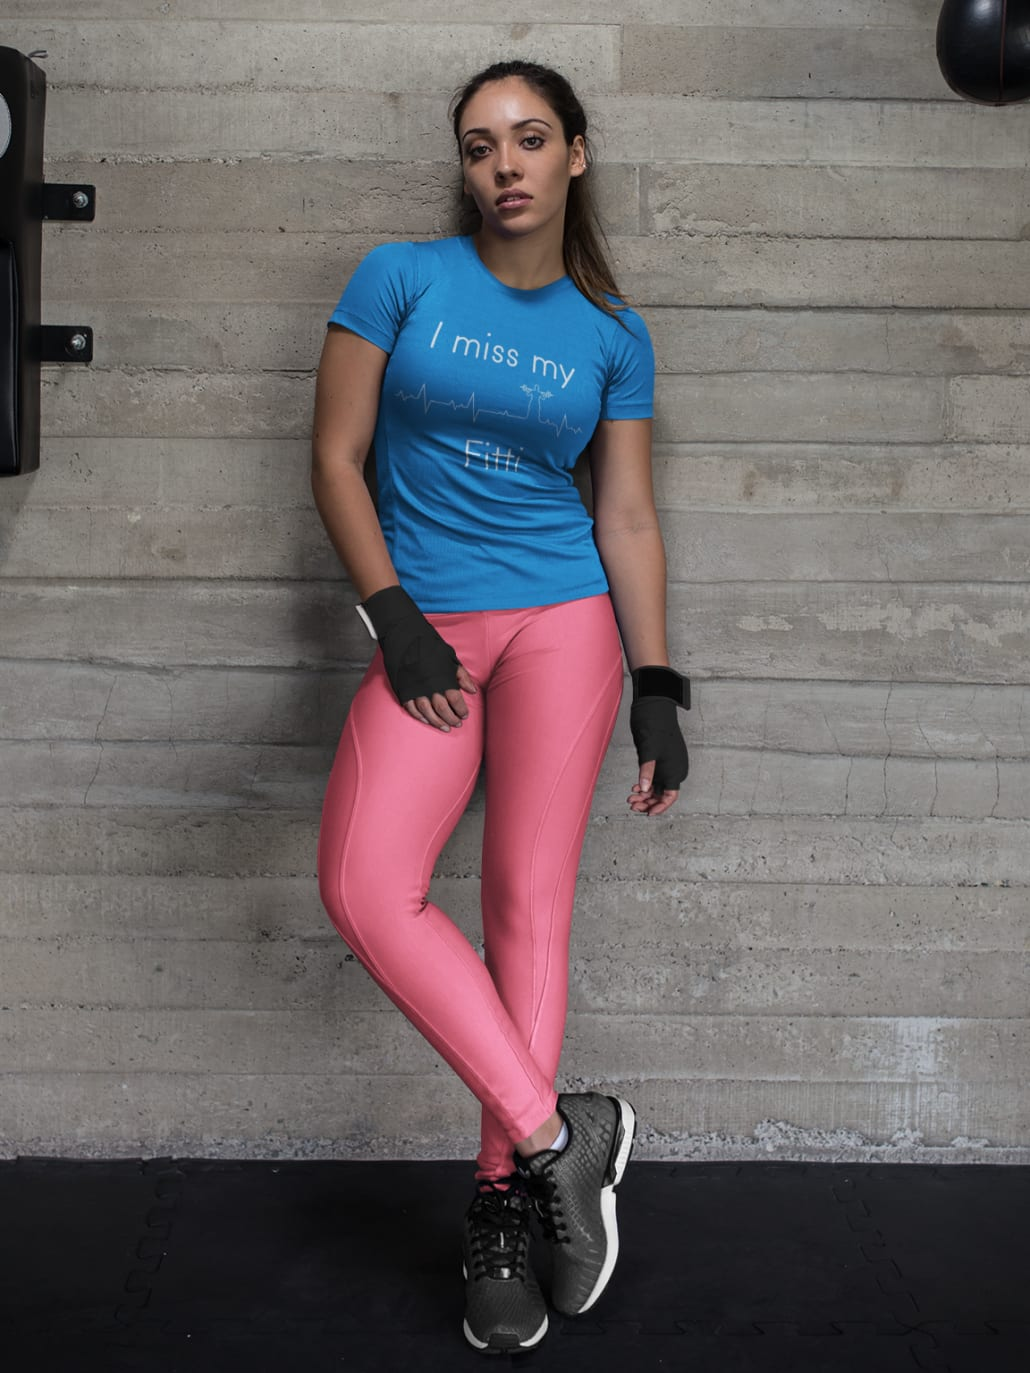 Junge Frau in Fitnessstudio mit pinkem Top und blauen Leggings